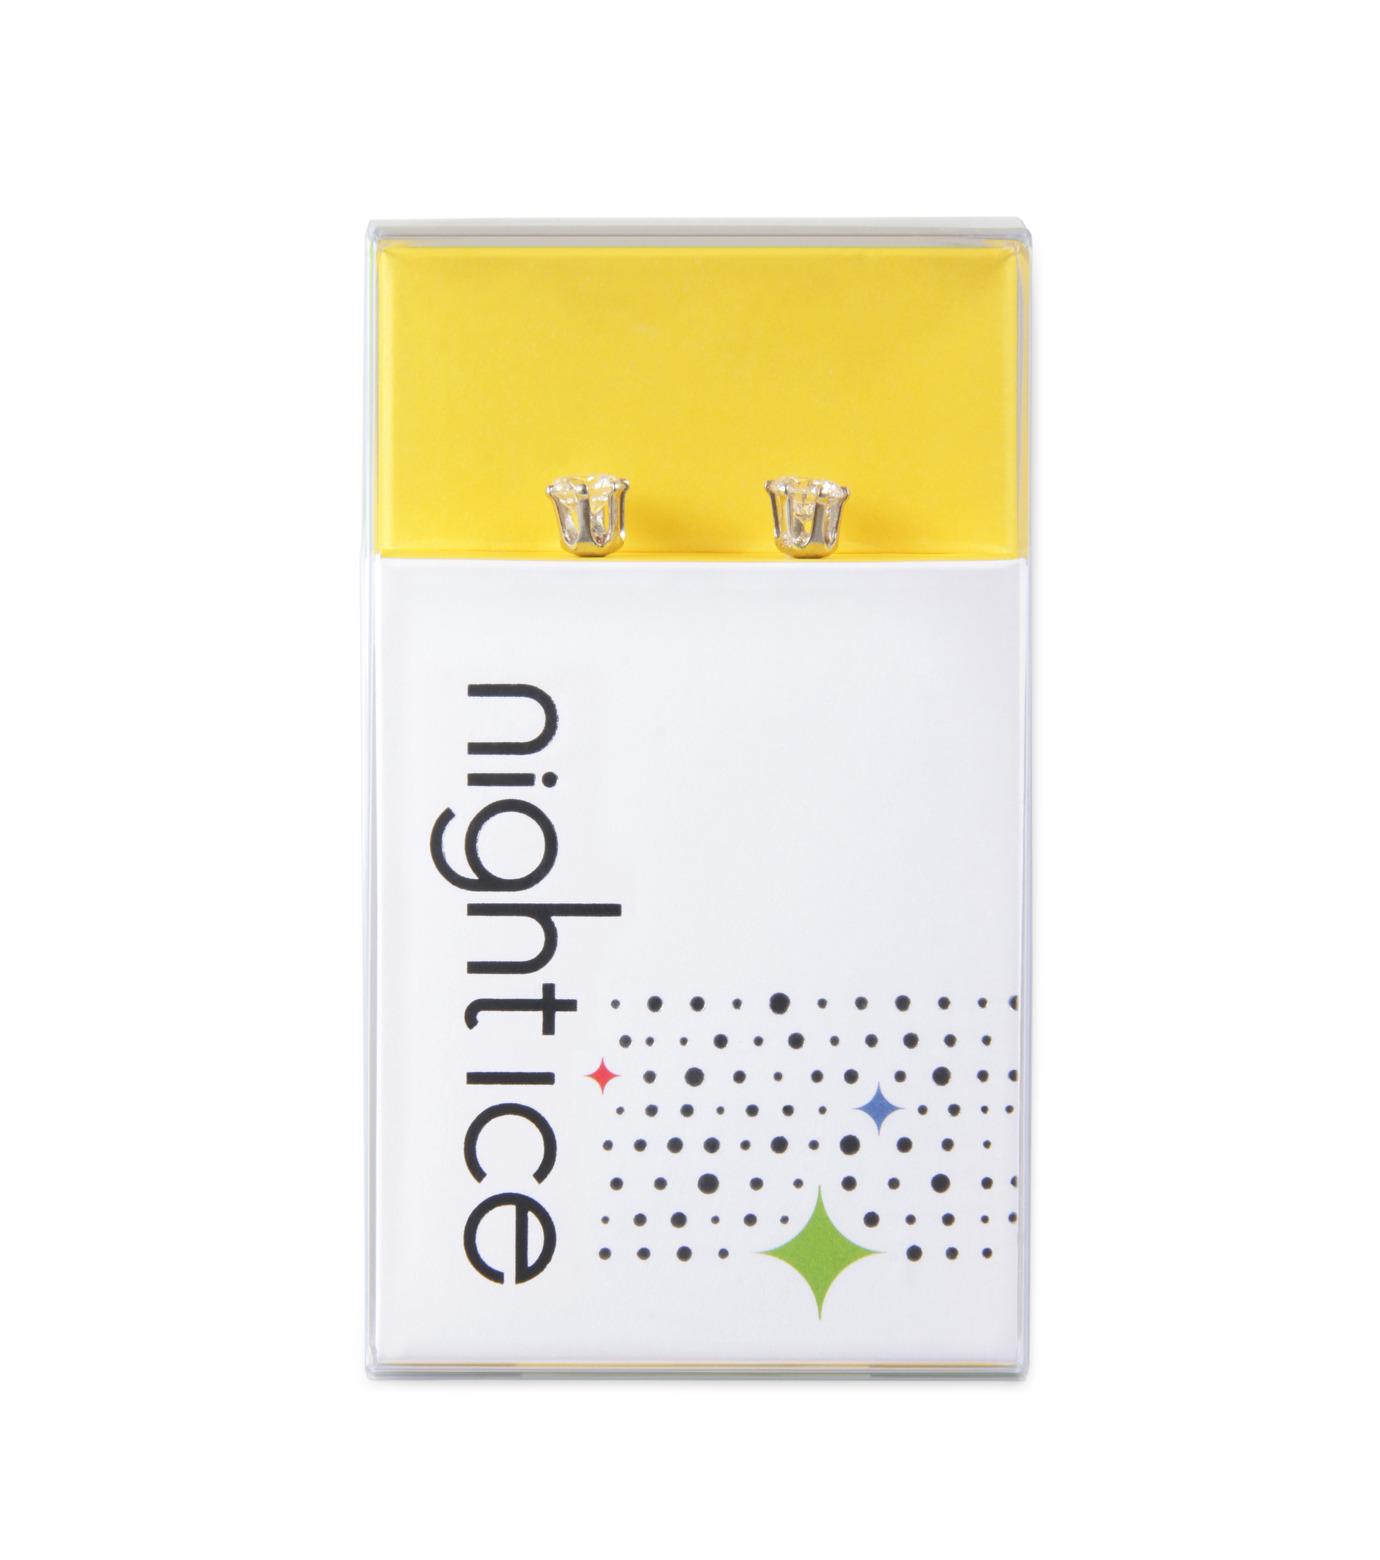 Night Ice(ナイトアイス)のOriginal Yellow-YELLOW(ガジェット/ライト/gadgets/light)-Original-32 拡大詳細画像1